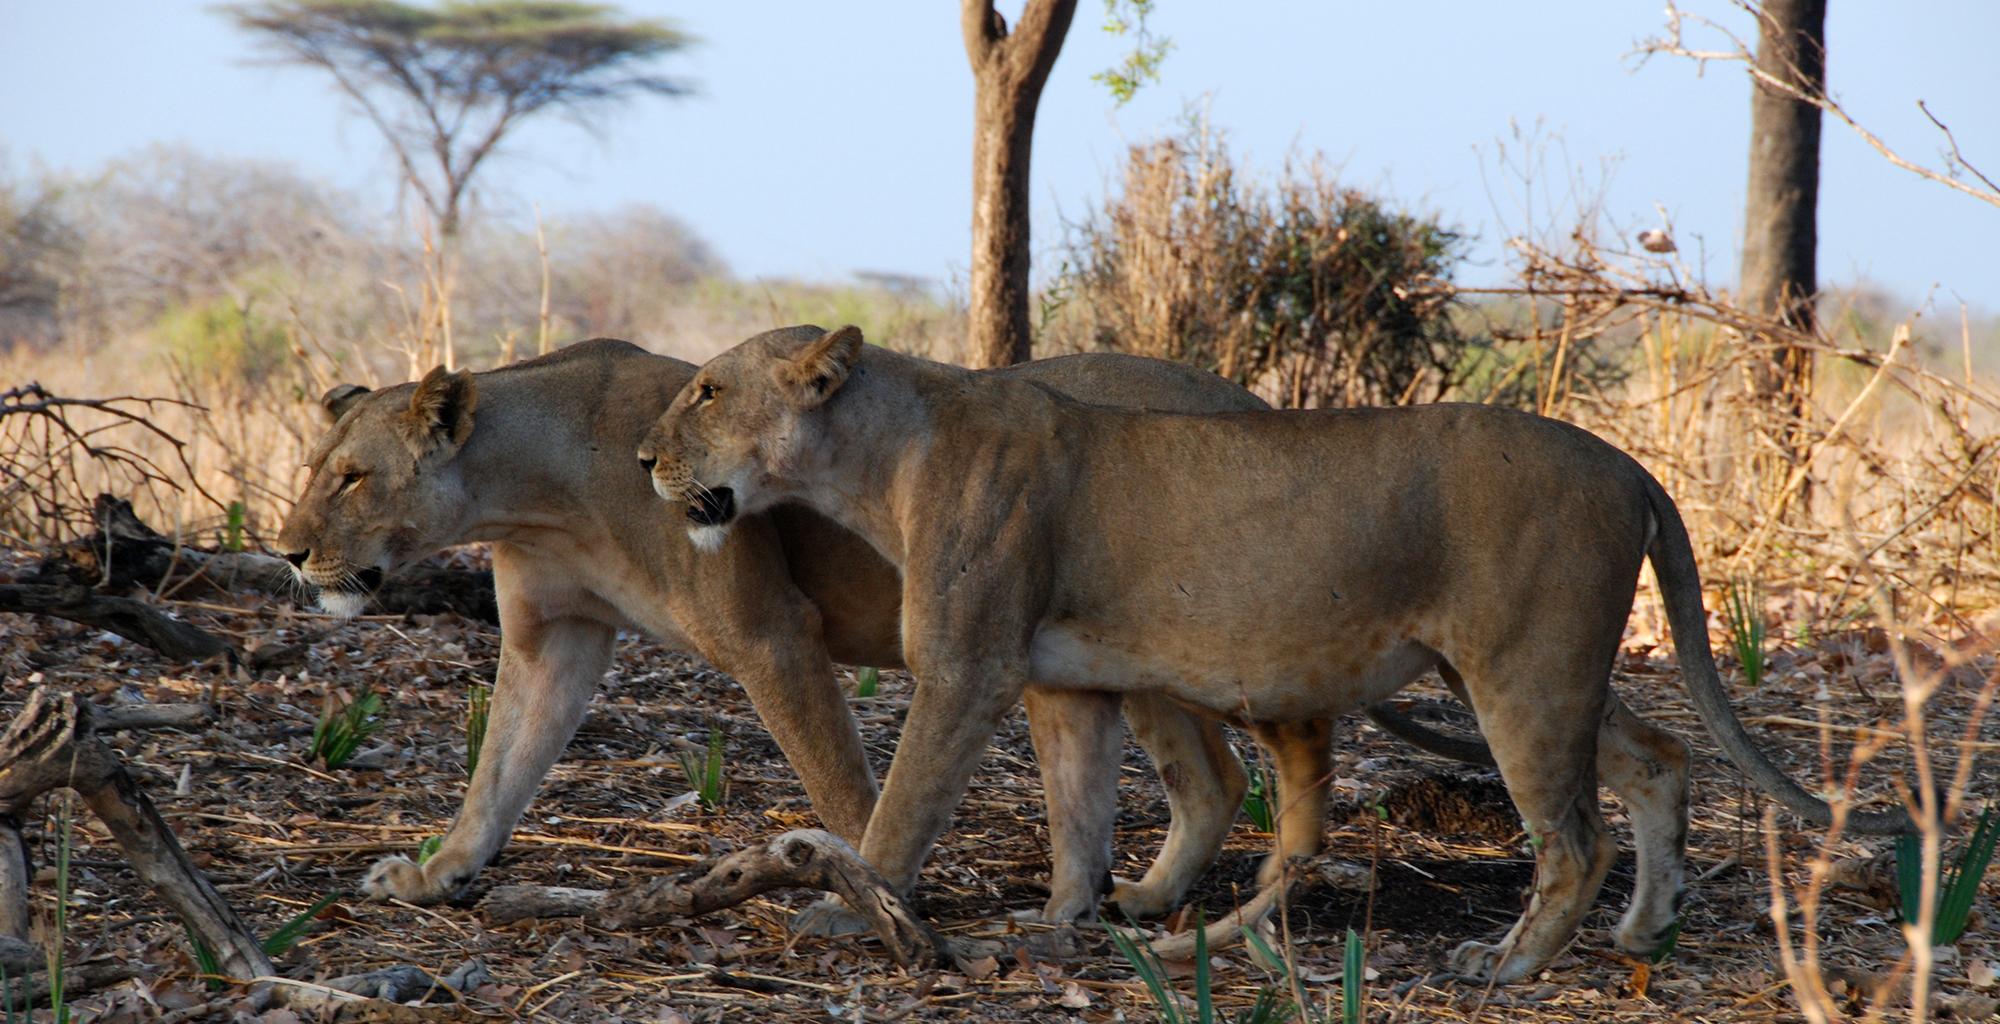 Tanzania-Ruaha-National-Park-Lions